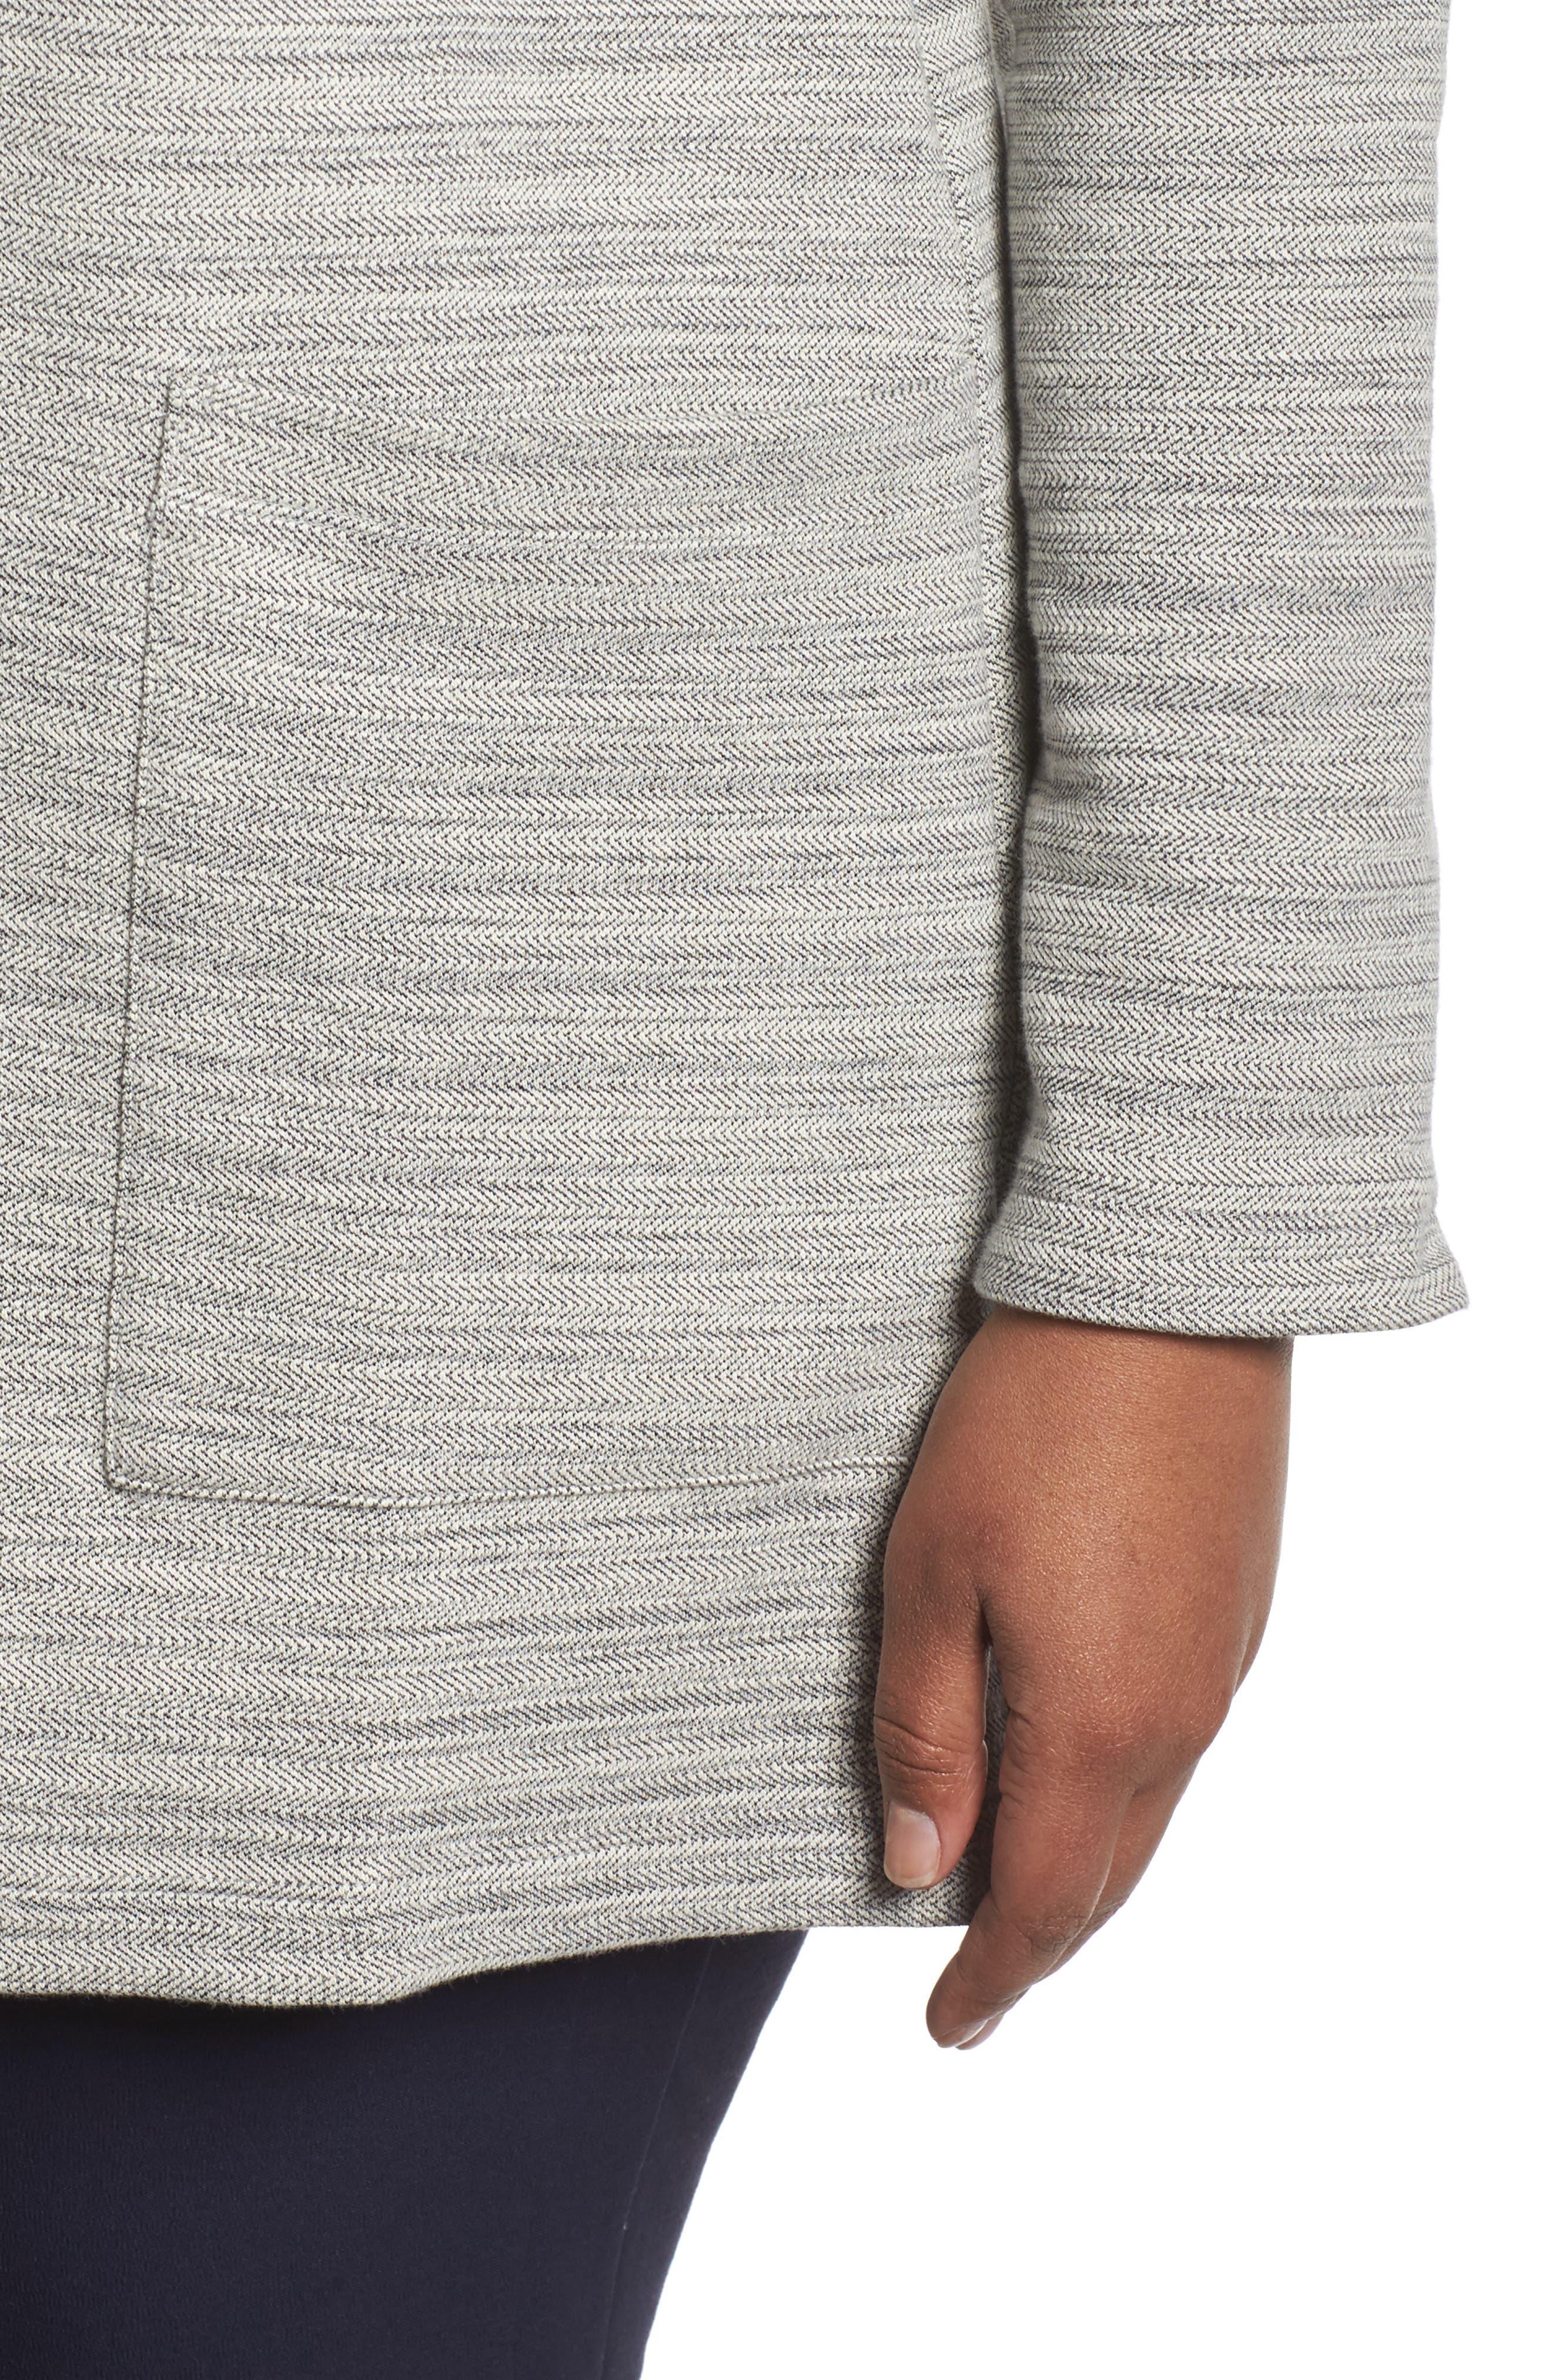 Cotton Blend Tweed Jacket,                             Alternate thumbnail 4, color,                             Dark Pearl